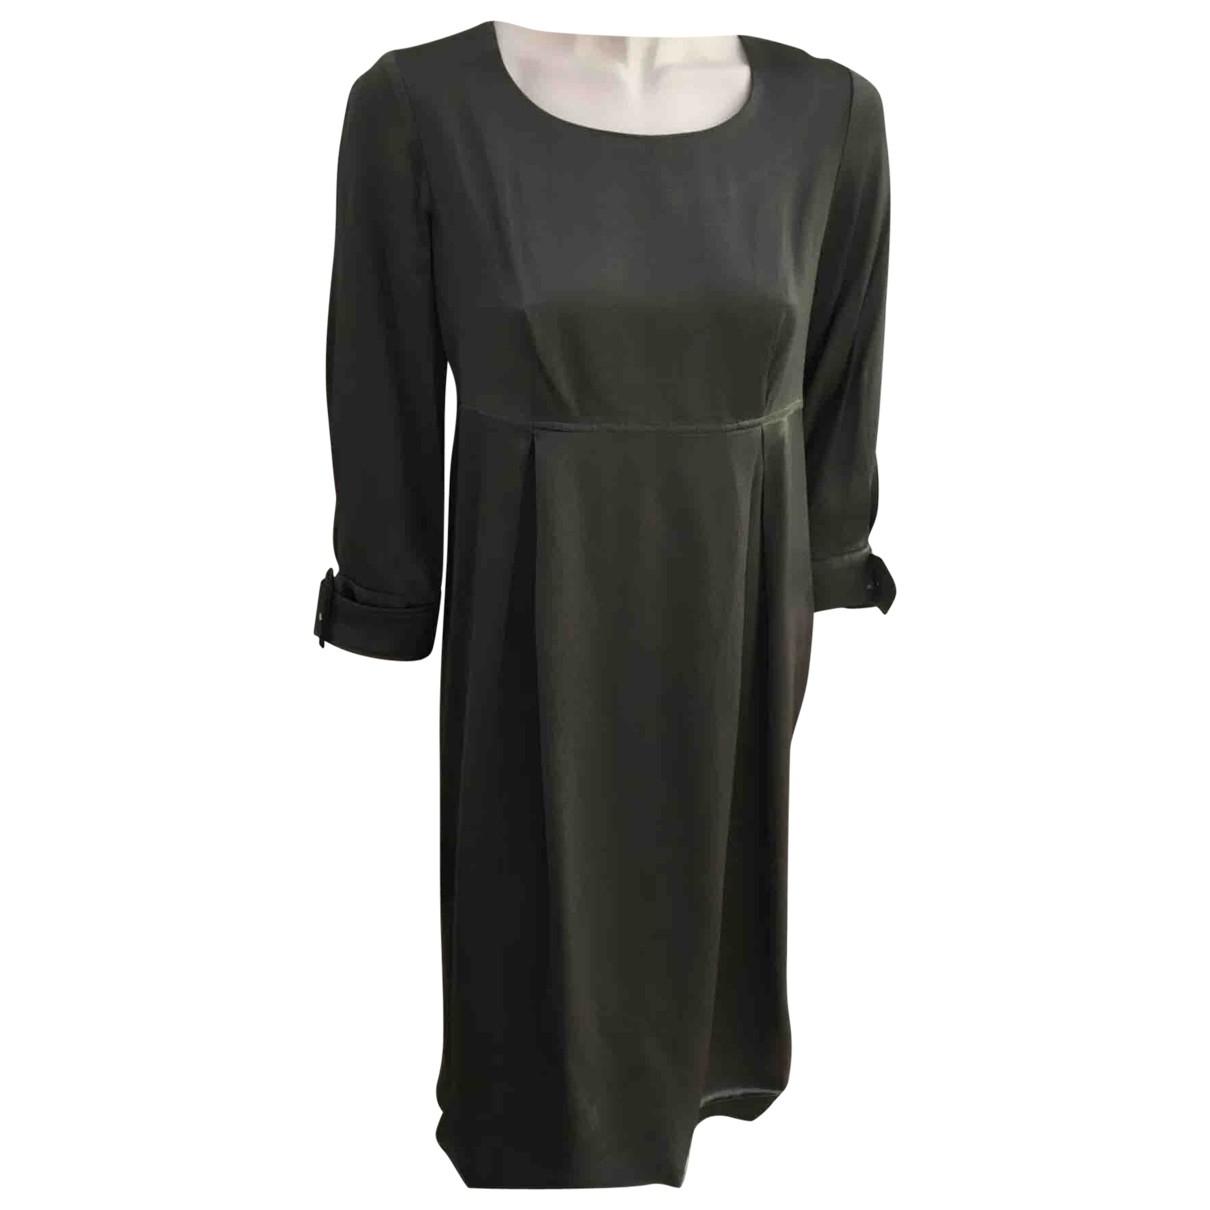 Burberry \N Kleid in  Khaki Synthetik